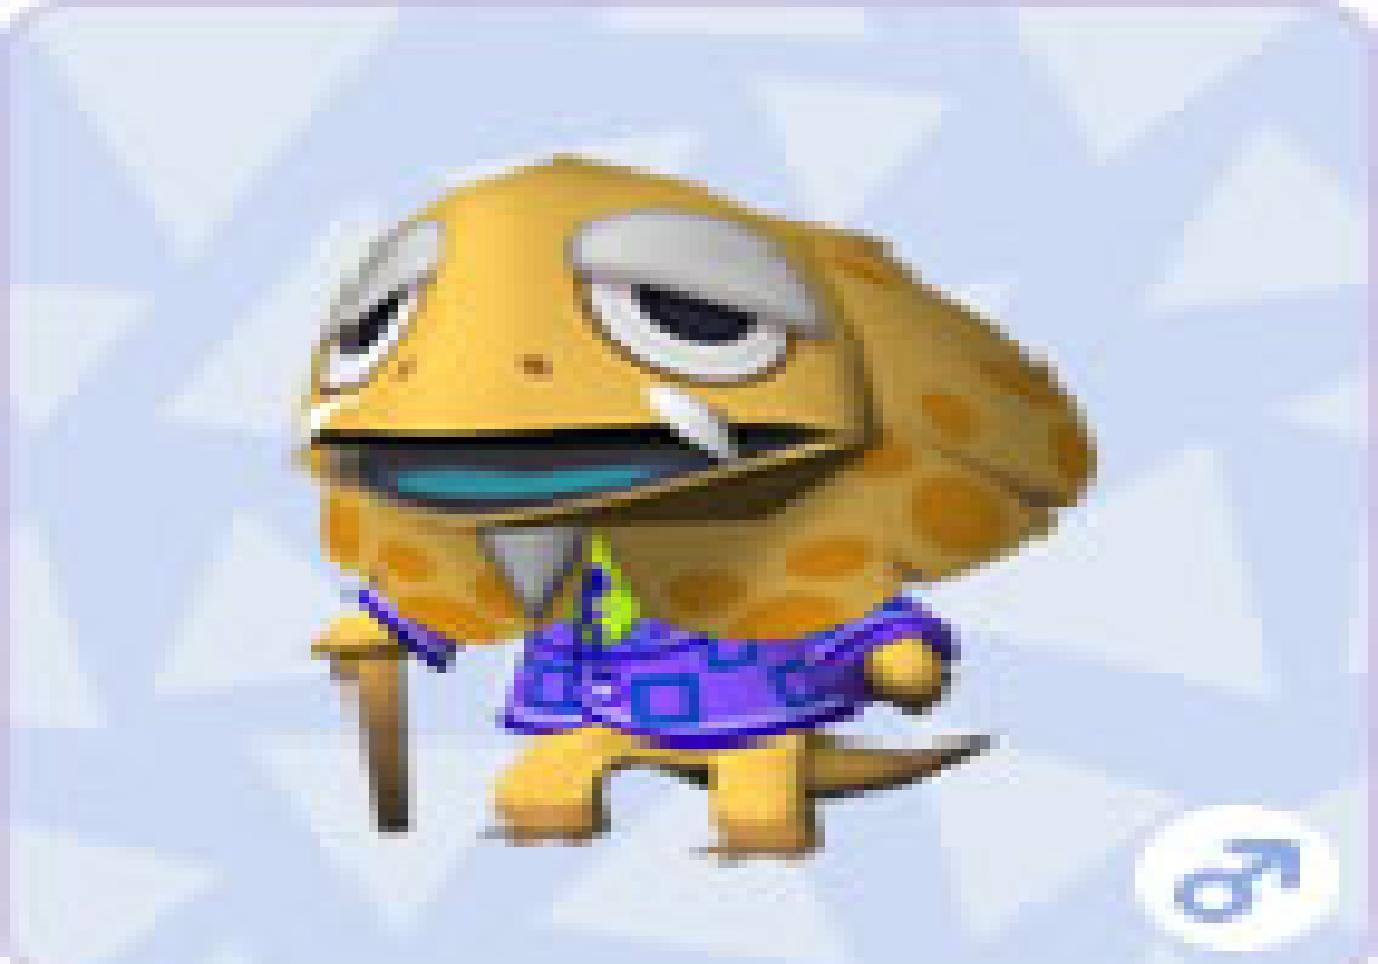 Master Frillard